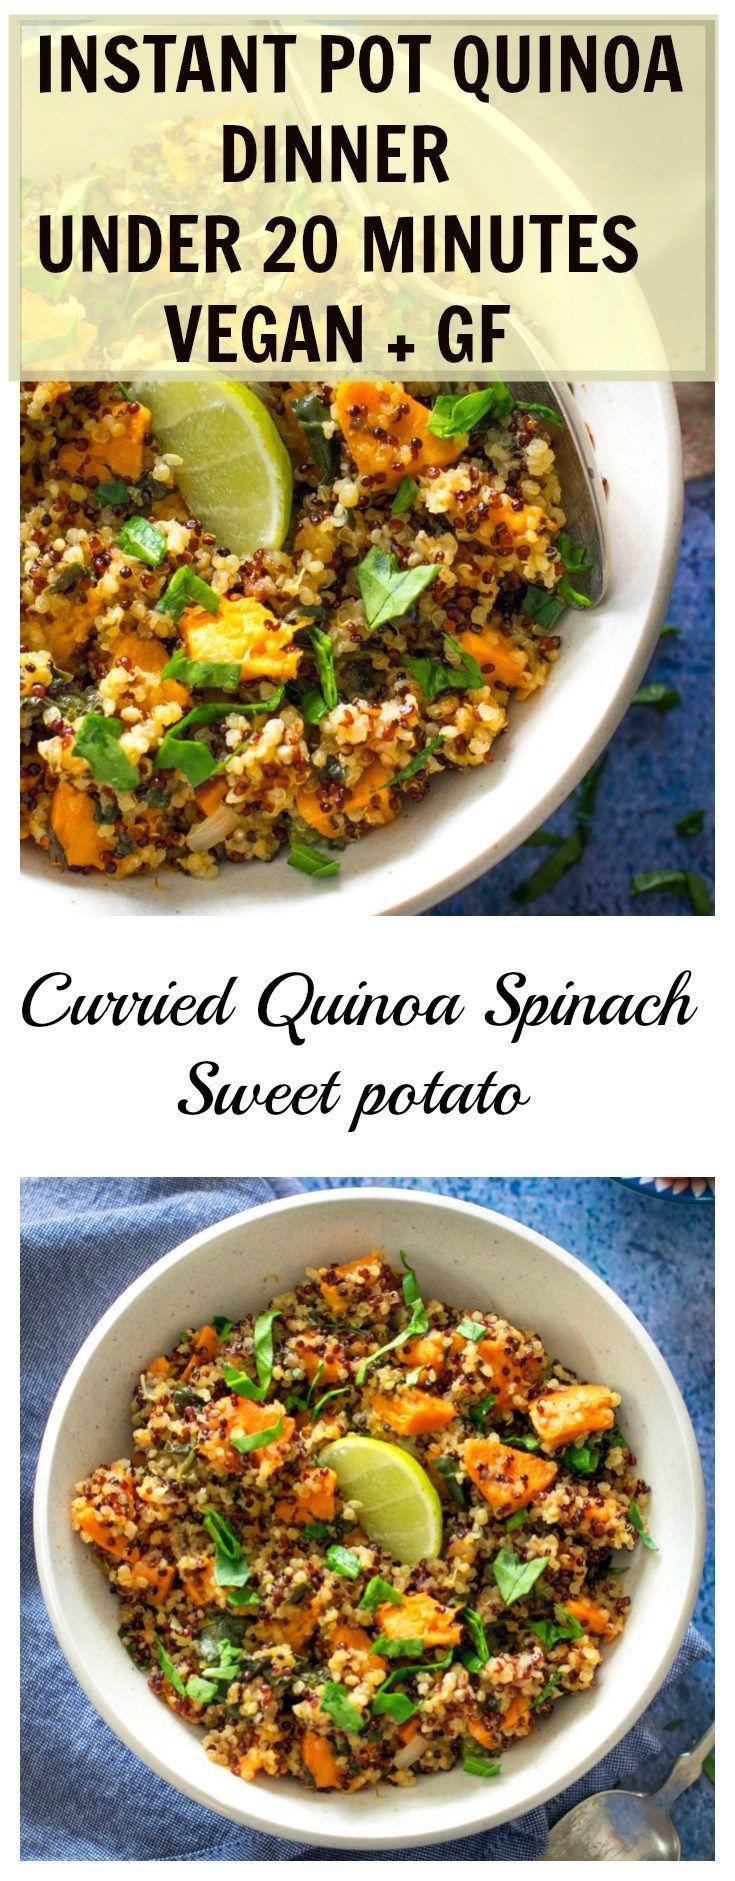 Instant pot curried quinoa spinach sweet potato under 20 minutes makes a healthy vegan dinner . How to make quinoa .Recipes using quinoa . Gluten free vegan dinner recipes. How to pressure cook quinoa.